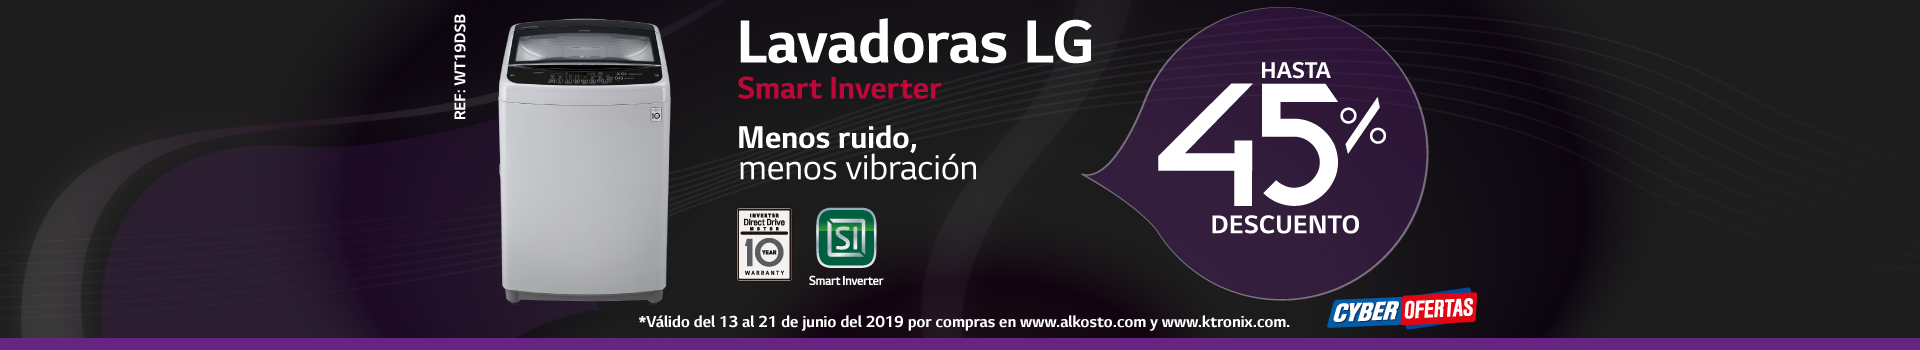 AK-KT LB LG LAVADORAS SMART-INVERTER  BCAT1-LAV 17 JUNIO